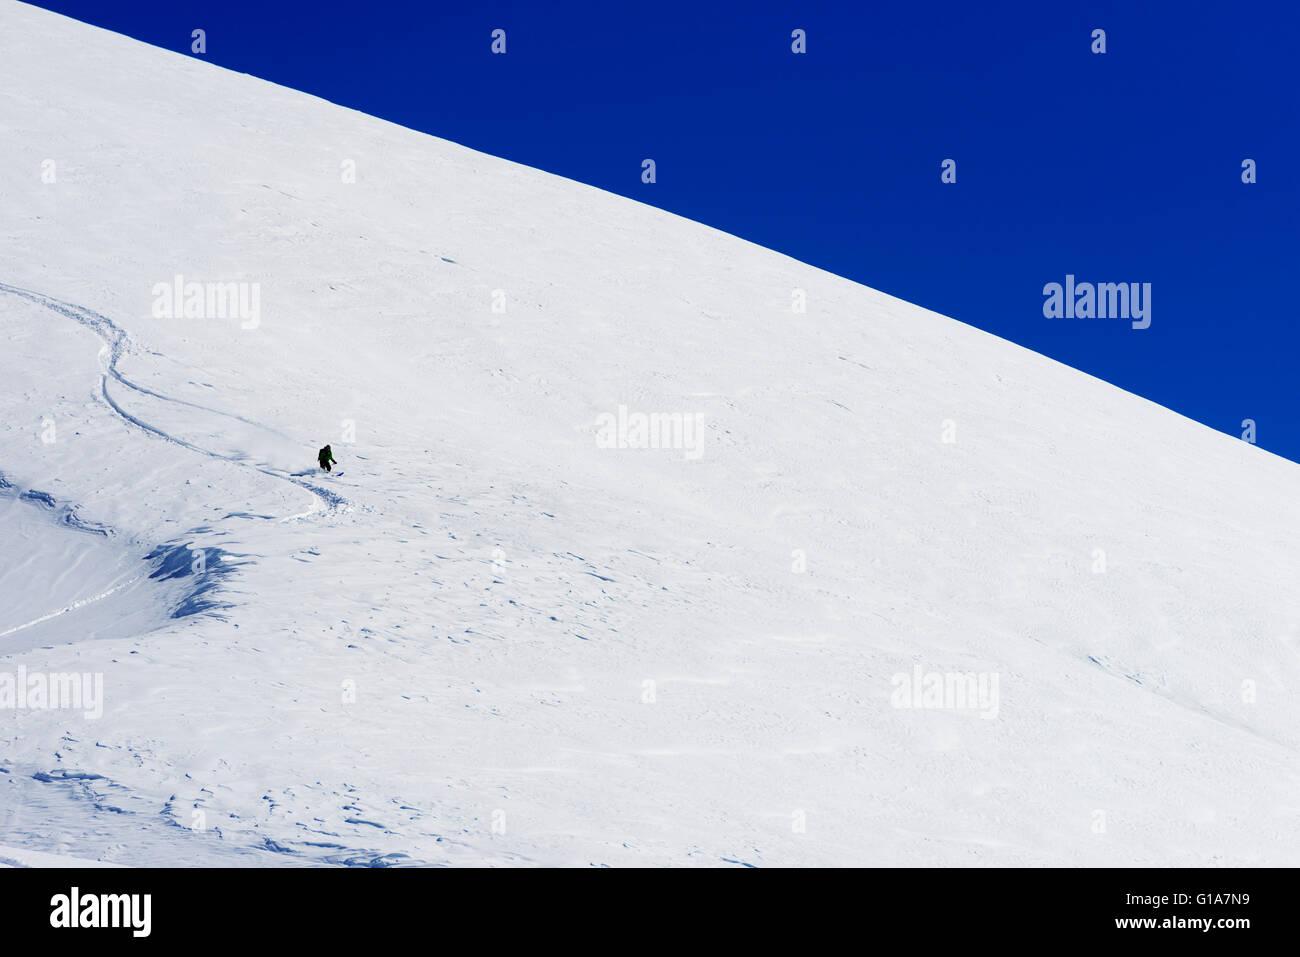 Eurasia, Caucasus region, Georgia, Gudauri ski resort, powder skiing - Stock Image